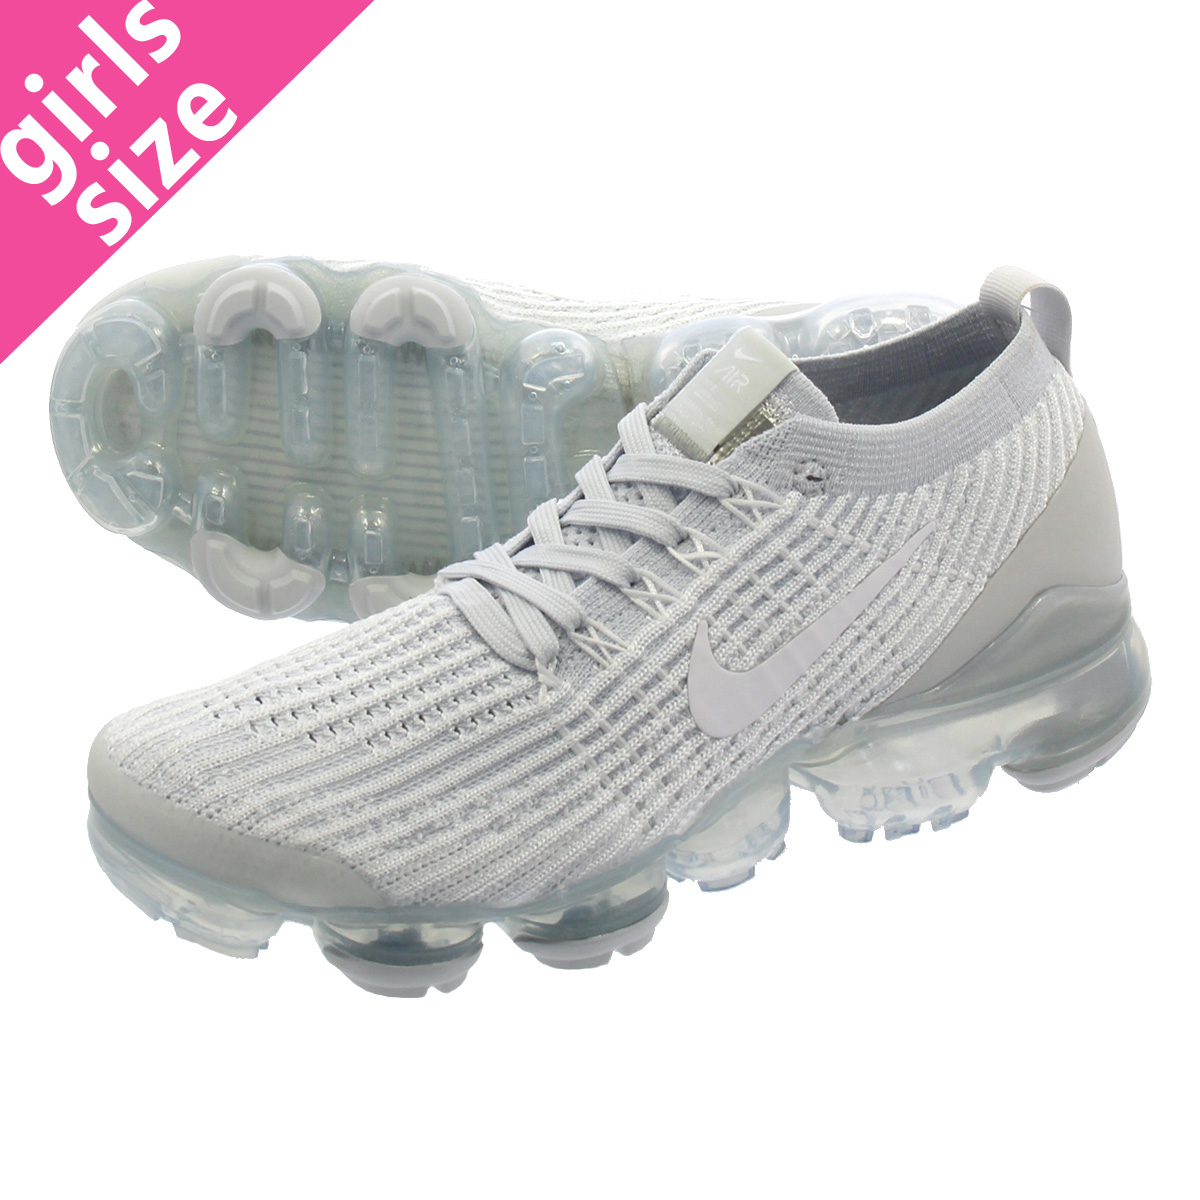 29701d99aa LOWTEX PLUS: NIKE WMNS AIR VAPORMAX FLYKNIT 3 Nike women vapor max fried  food knit 3 WHITE/WHITE/PURE PLATINUM/METALLIC SILVER aj6910-100 | Rakuten  Global ...